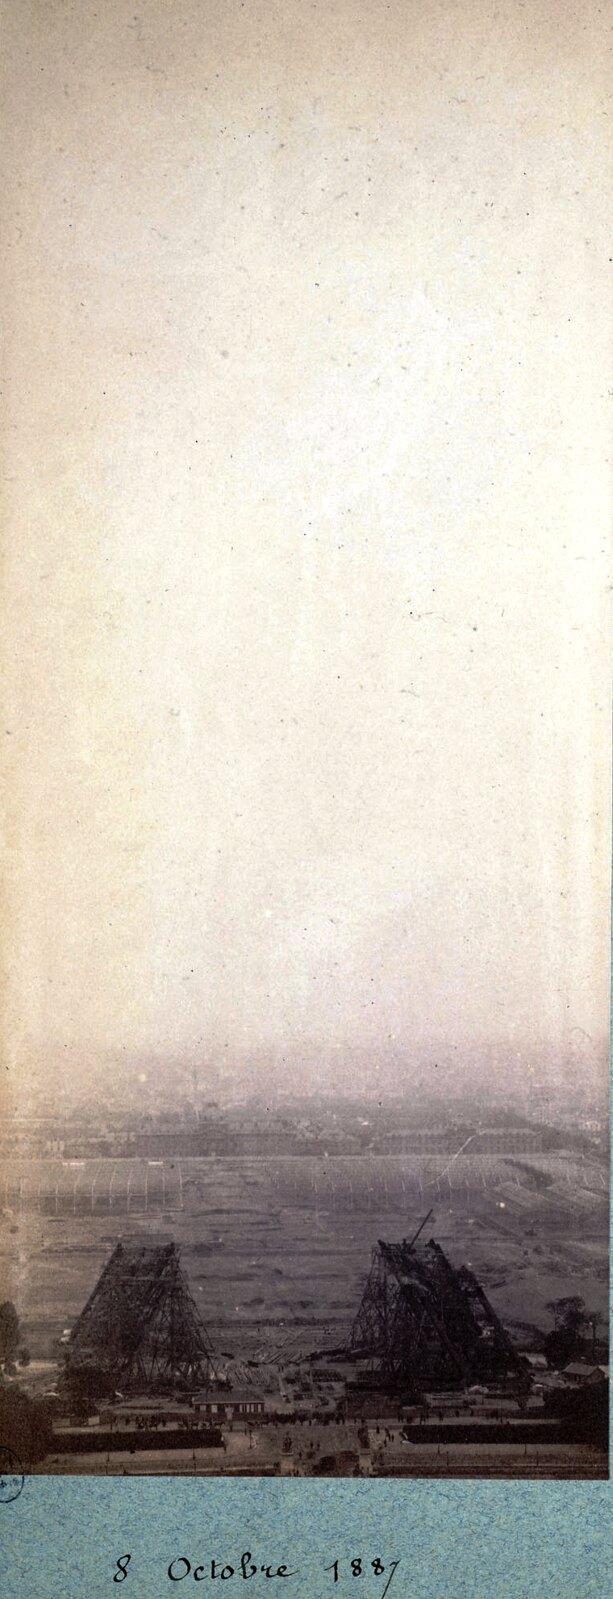 03. 1887. 9 октября